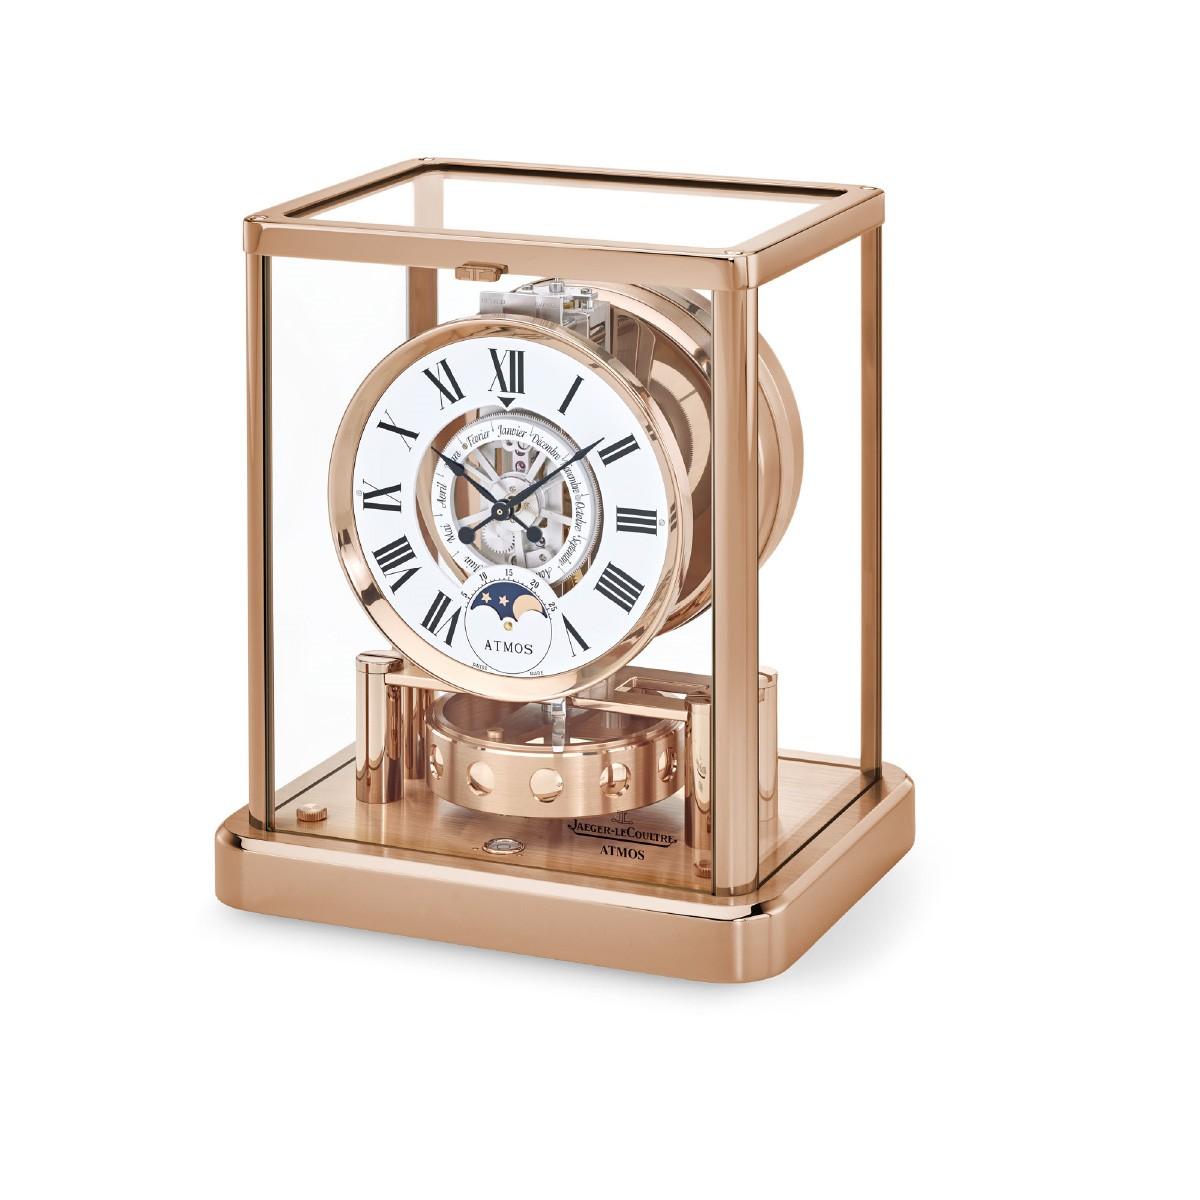 Produkt-9-JLC-Atmos-Classique-Phases-de-Lune-ref-5117201-Preis-8